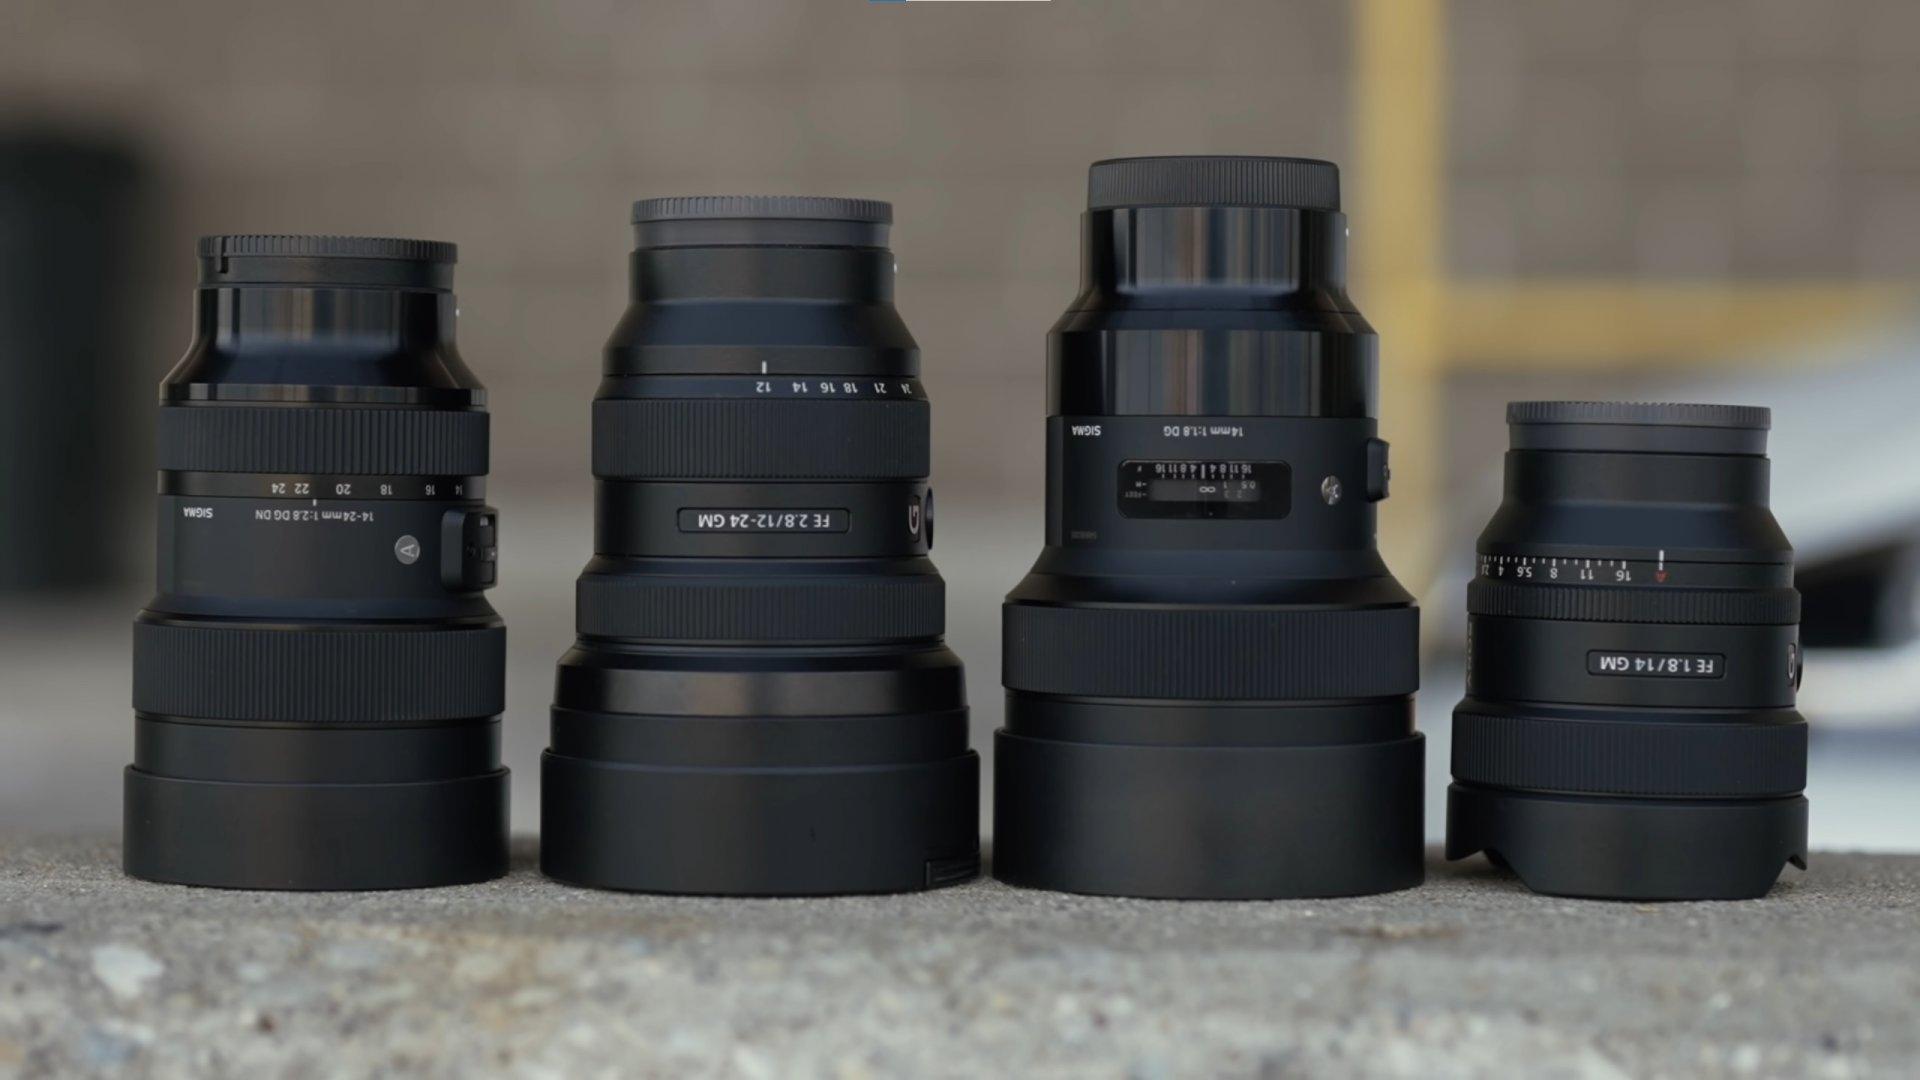 Sony FE 14mm f1.8 vs Sigma 14mm f1.8 vs Sony 12-24mm f2.8 vs Sigma 14-24mm f2.8.jpg